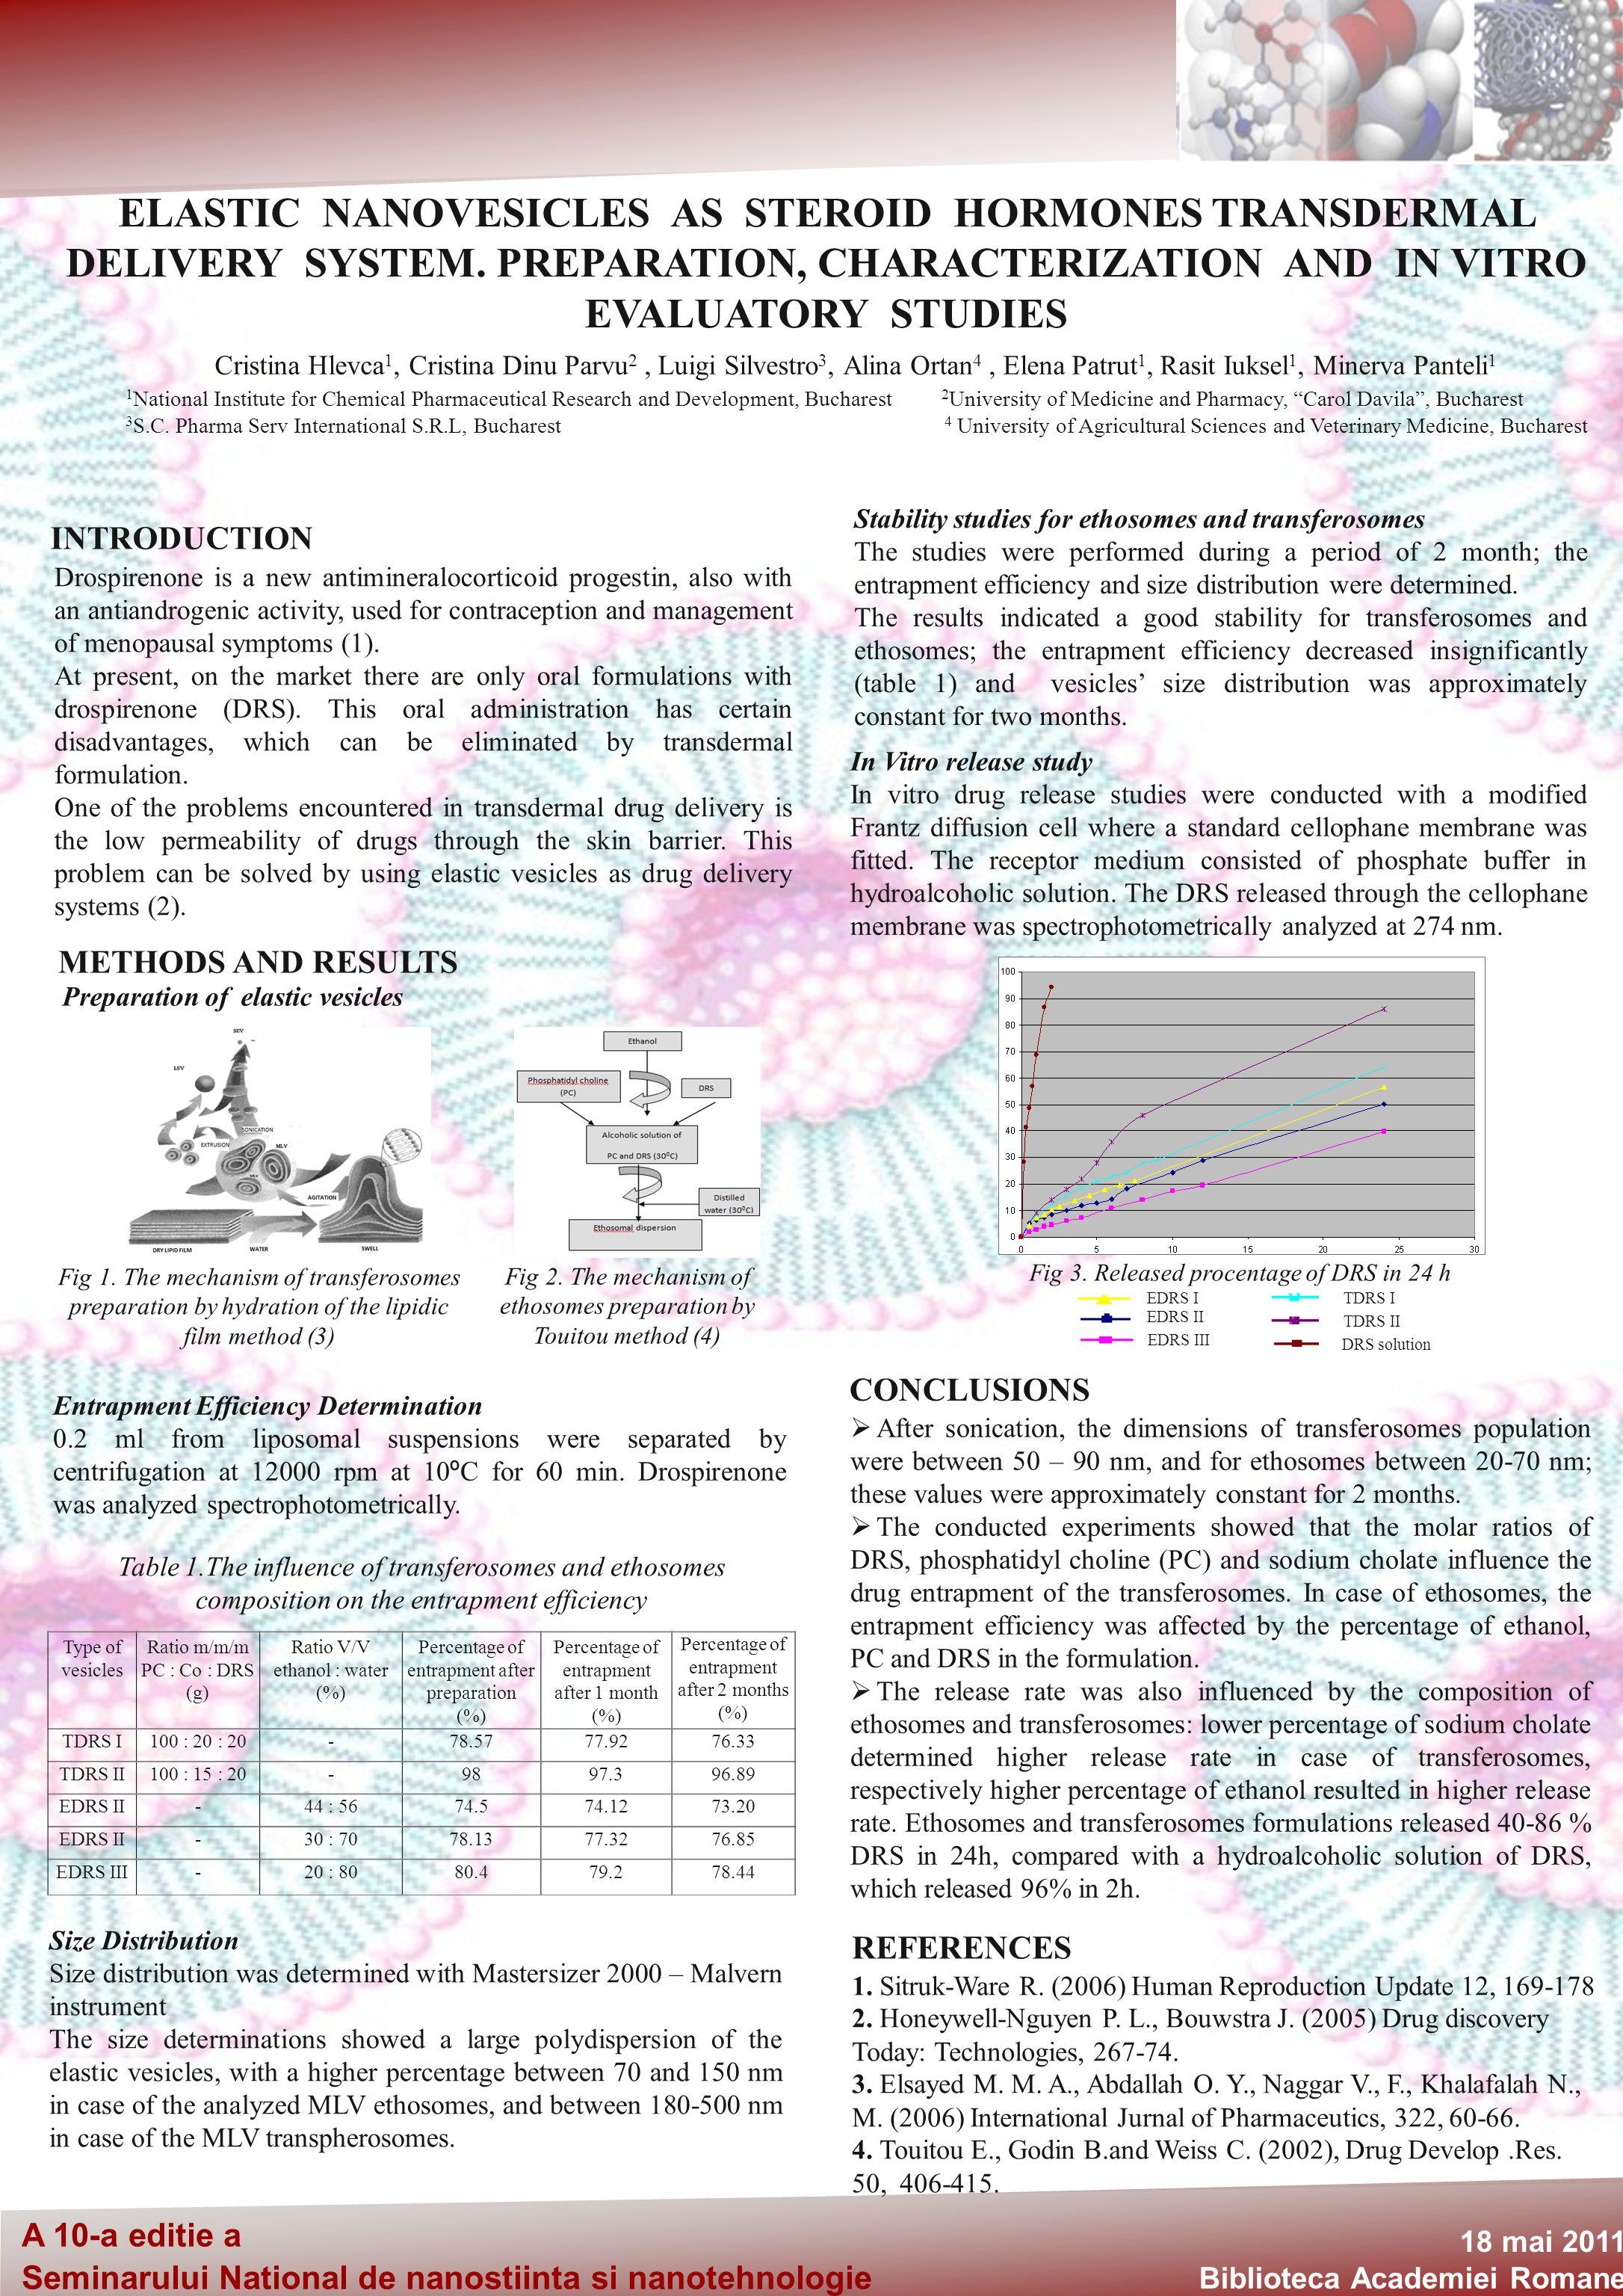 A 10-a editie a Seminarului National de nanostiinta si nanotehnologie 18 mai 2011 Biblioteca Academiei Romane ELASTIC NANOVESICLES AS STEROID HORMONES TRANSDERMAL DELIVERY SYSTEM.